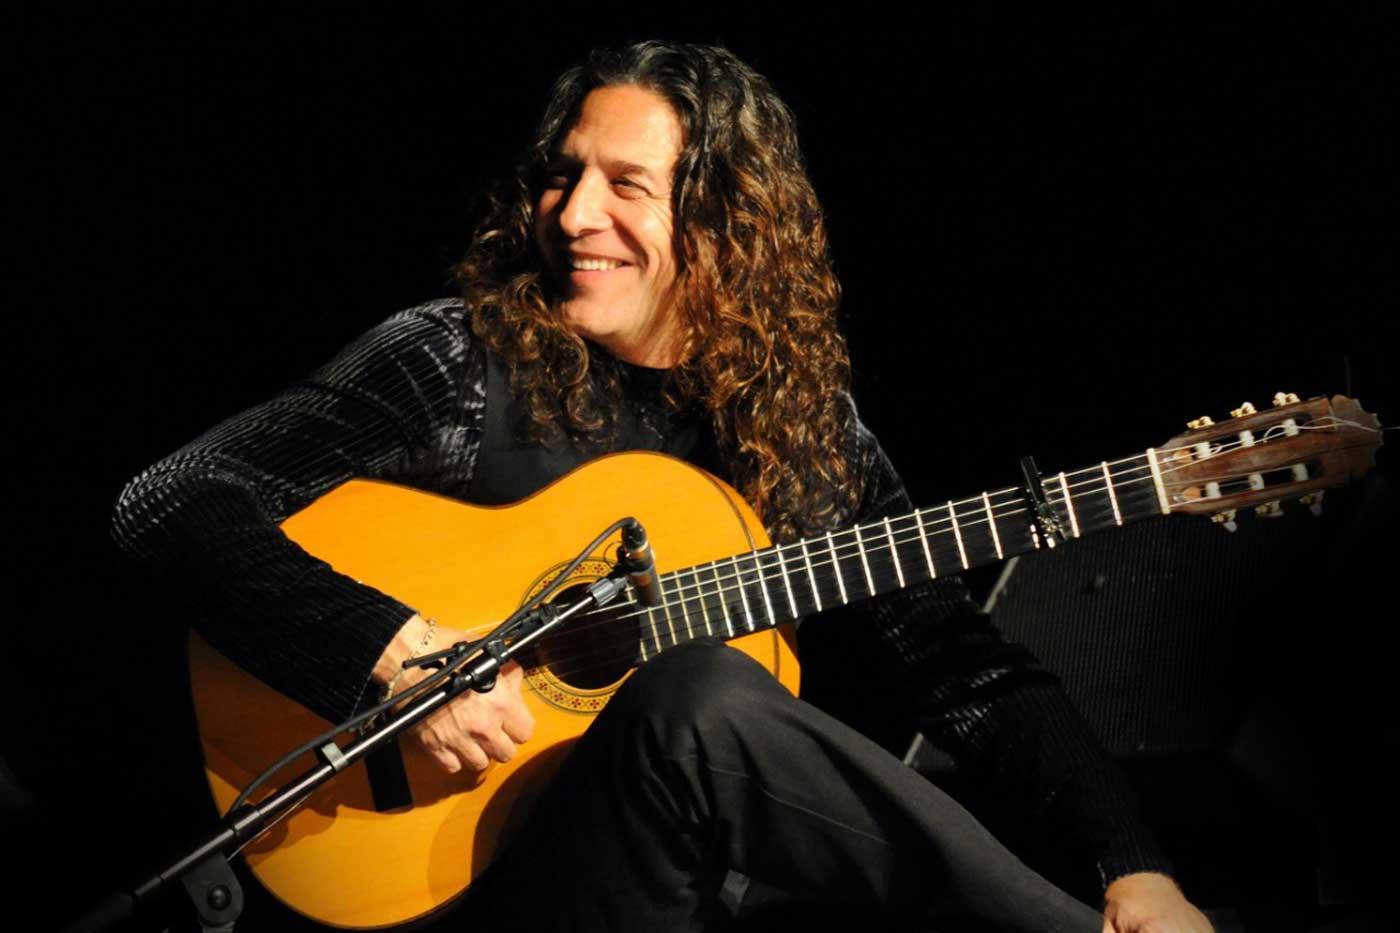 Flamenco On fire vuelve a Pamplona en agosto cargado de actuaciones